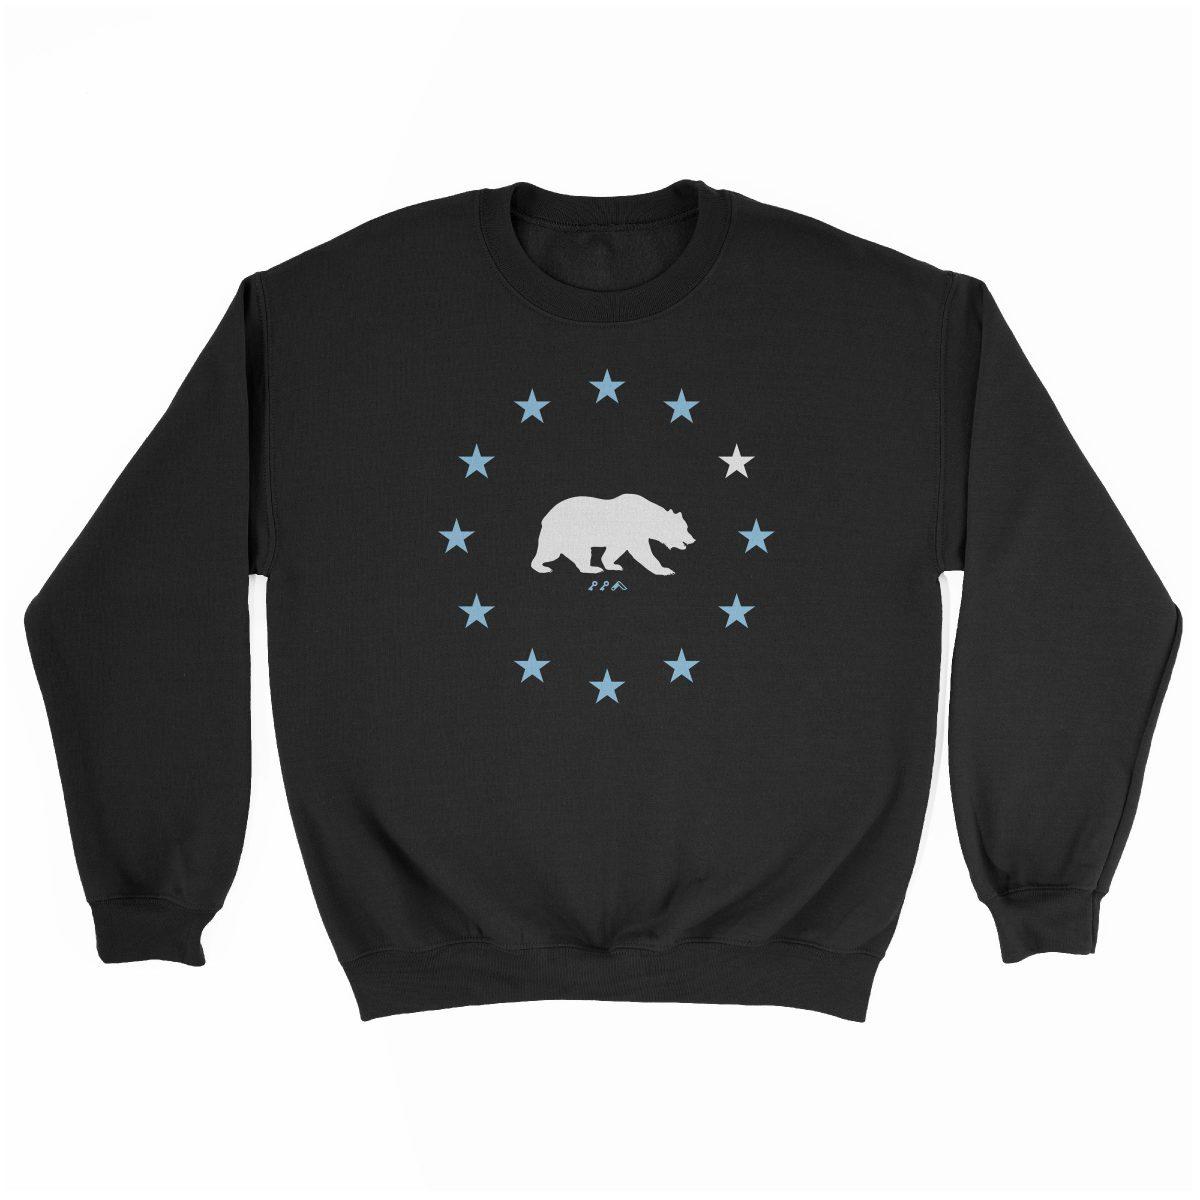 STAR GAZING cal bear california republic sweatshirt in black at kikicutt.com